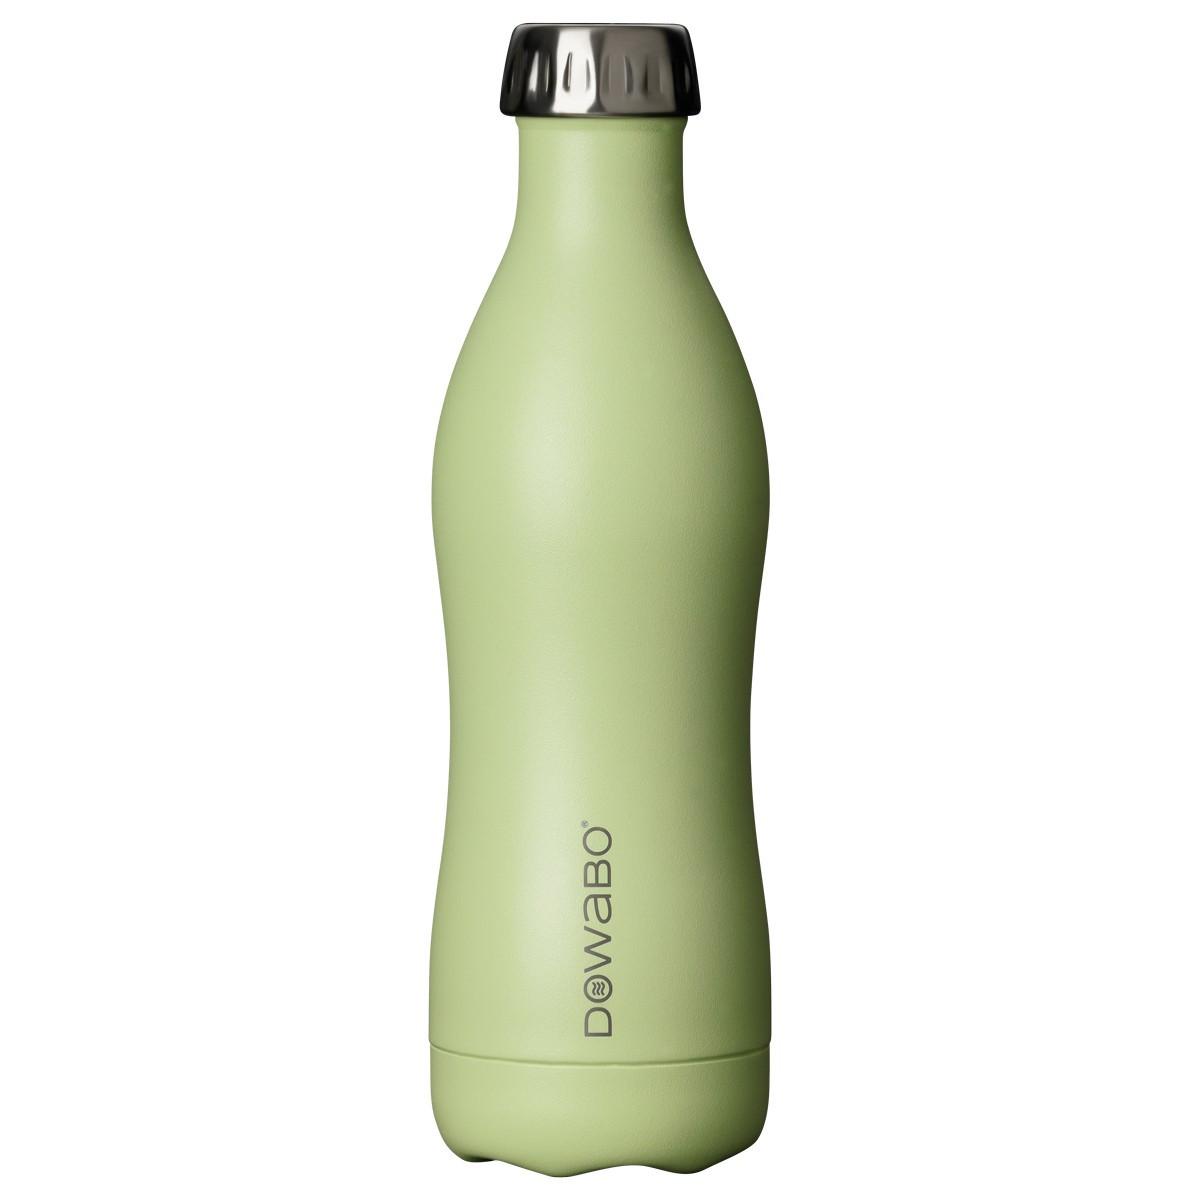 DOWABO® Bottle - Grasshopper 500ml Cocktail Collection